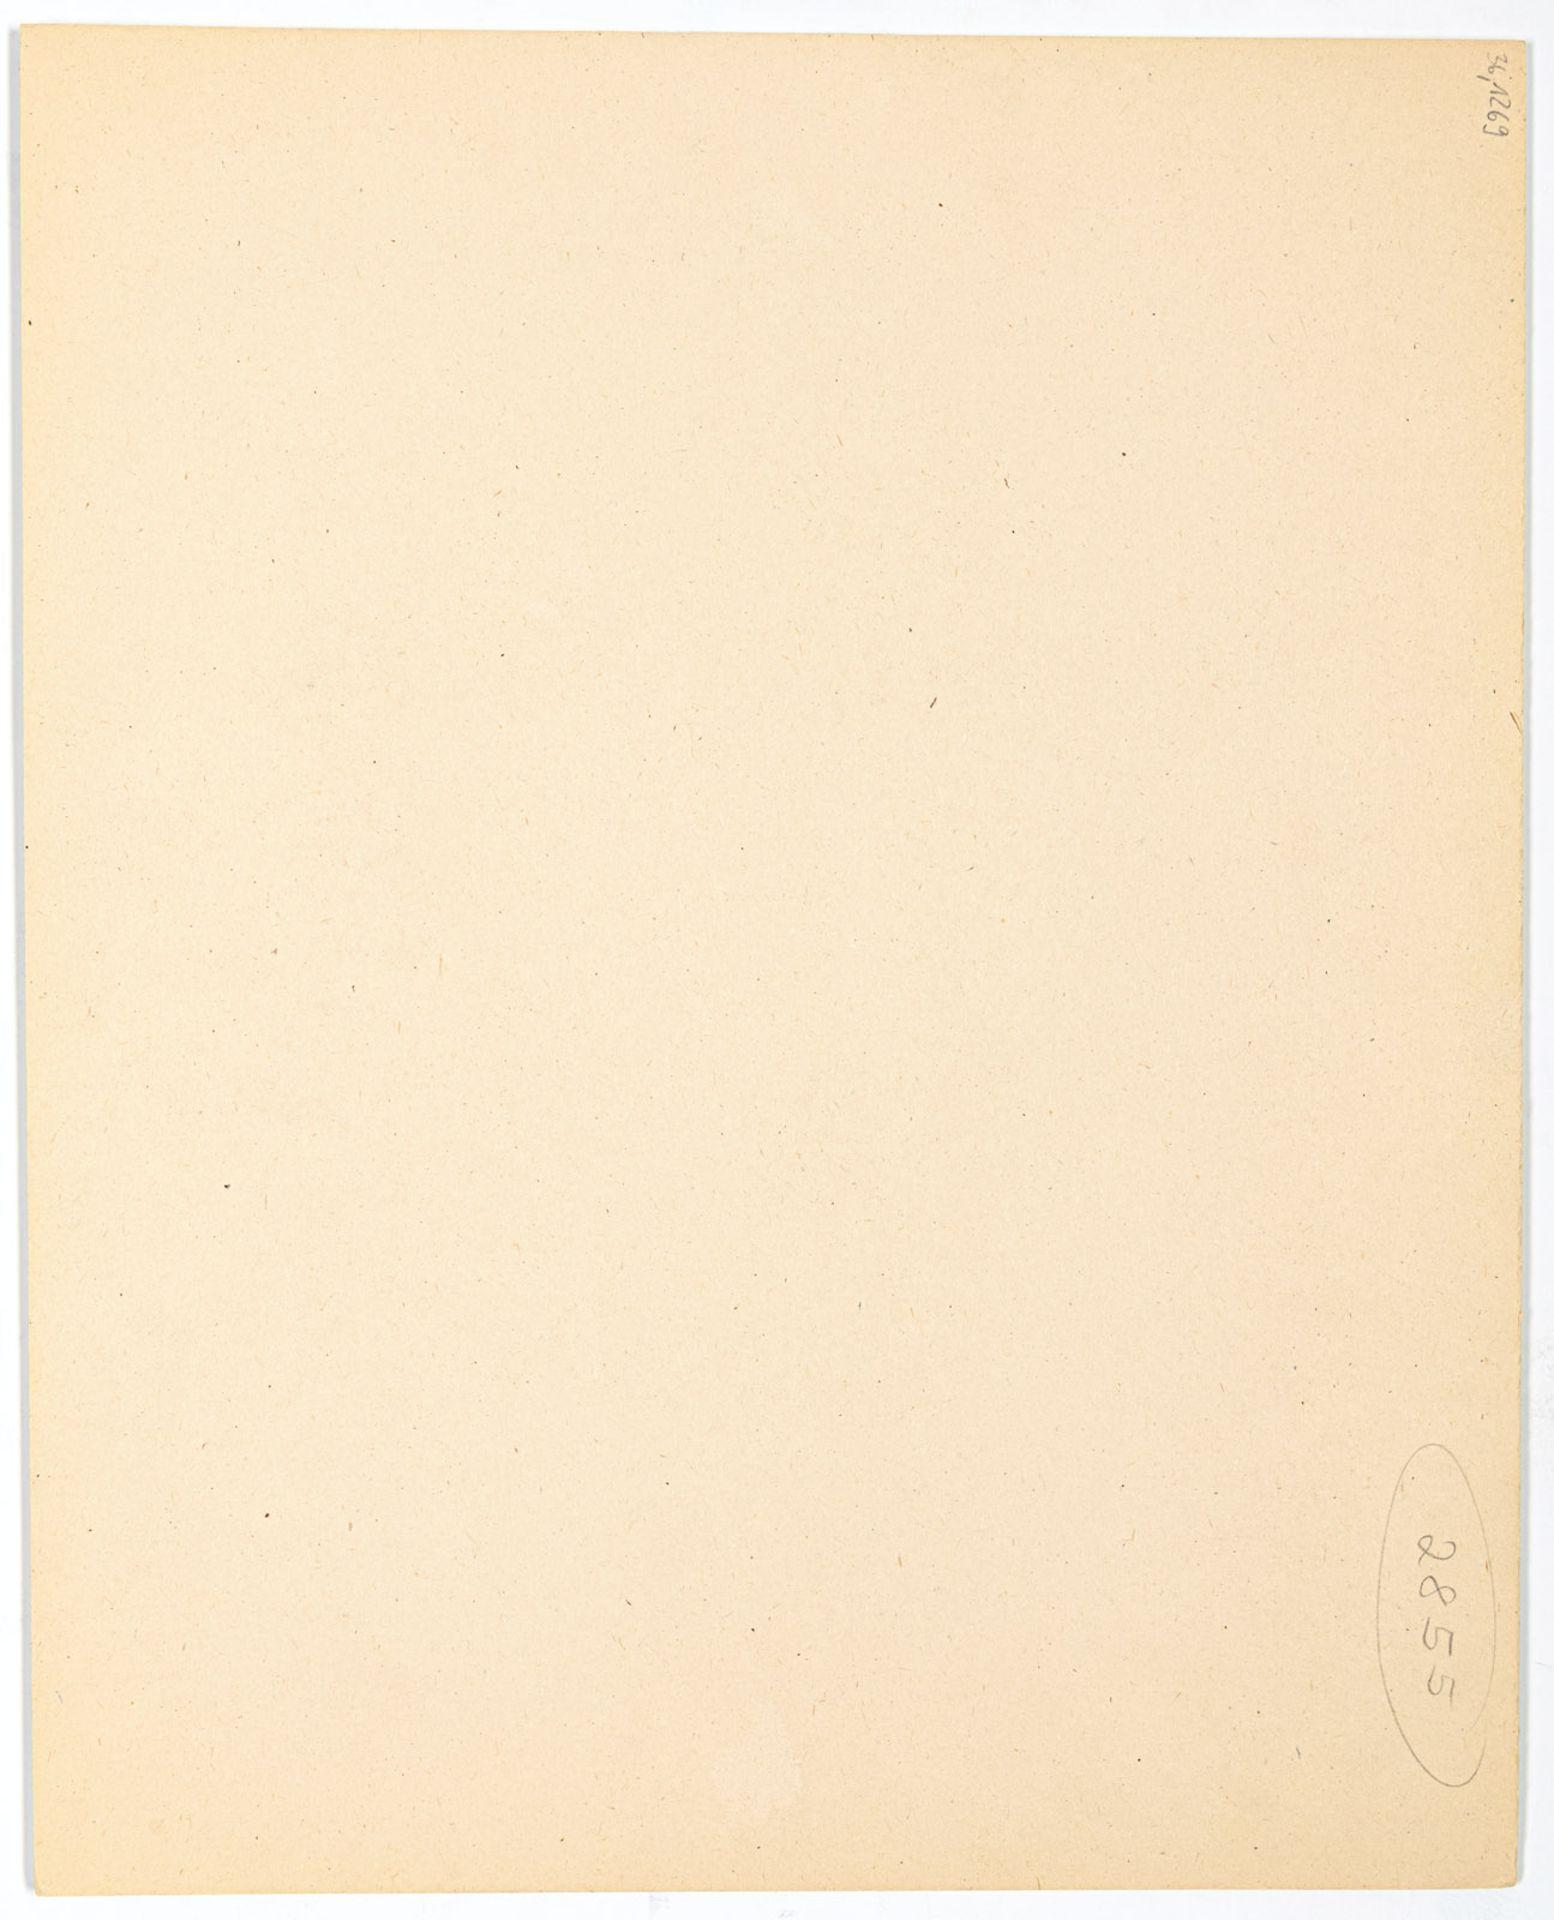 Purrmann, Hans - Image 6 of 6